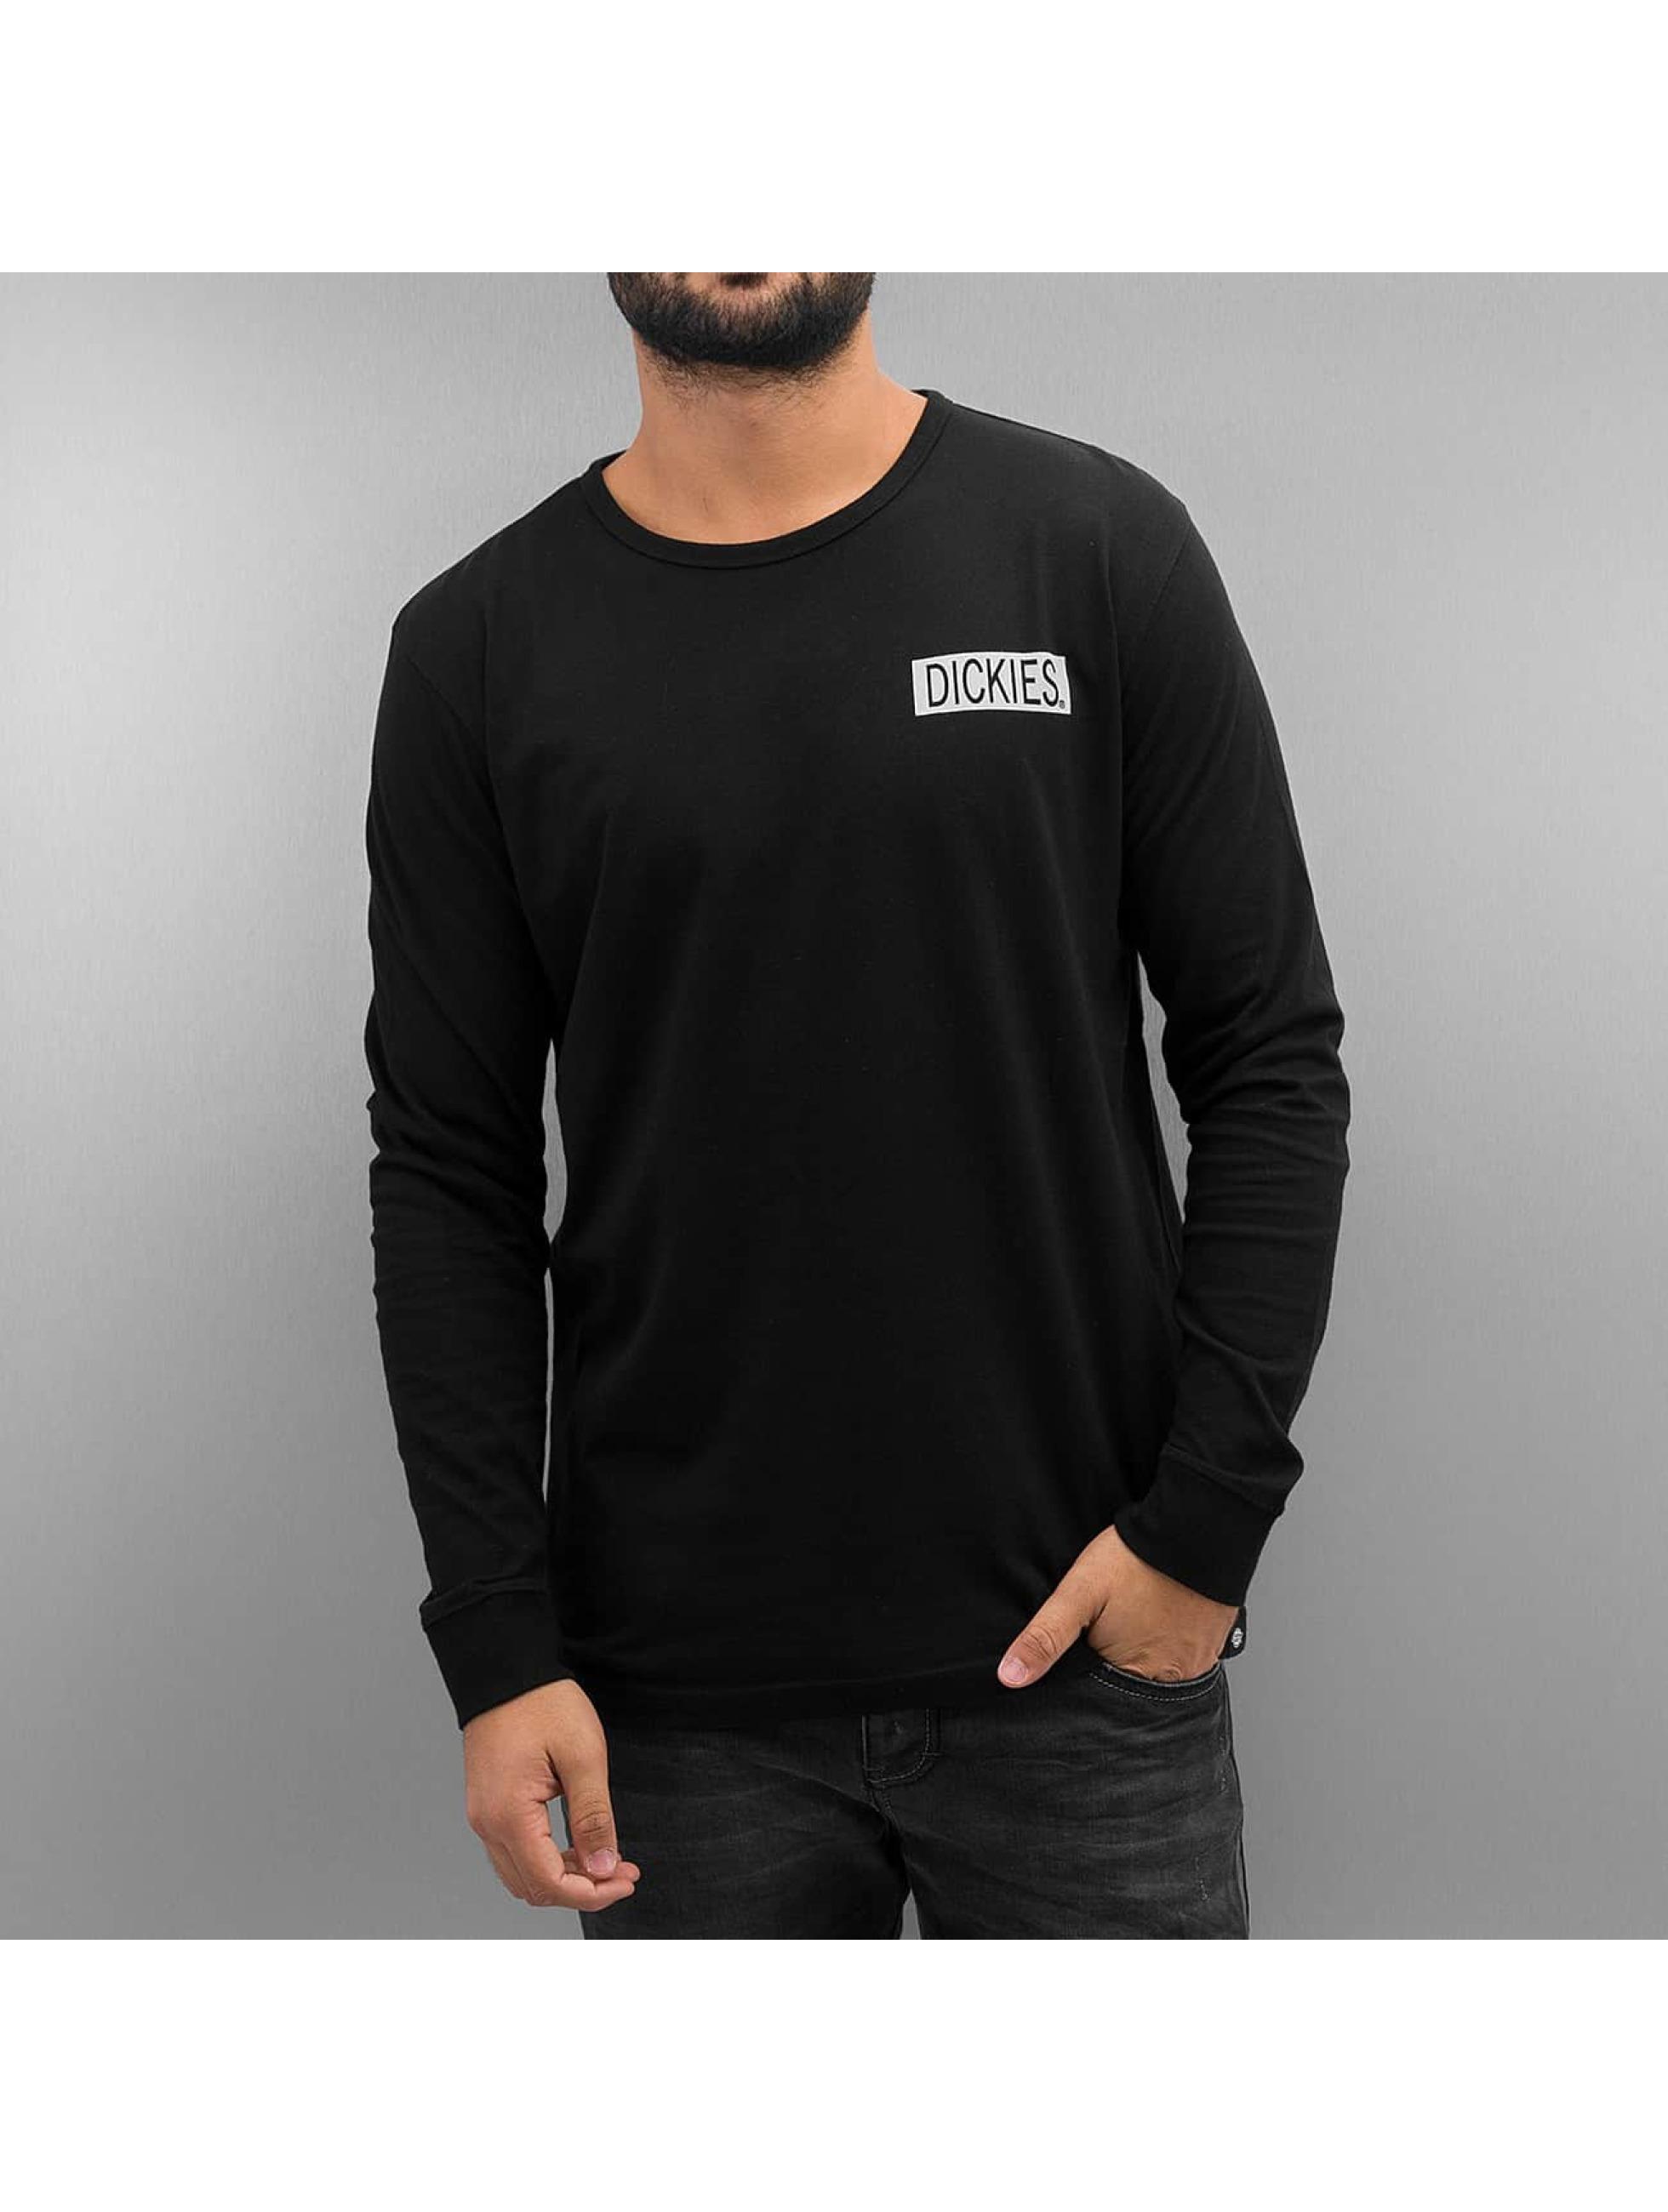 Dickies T-Shirt manches longues Kimmell noir